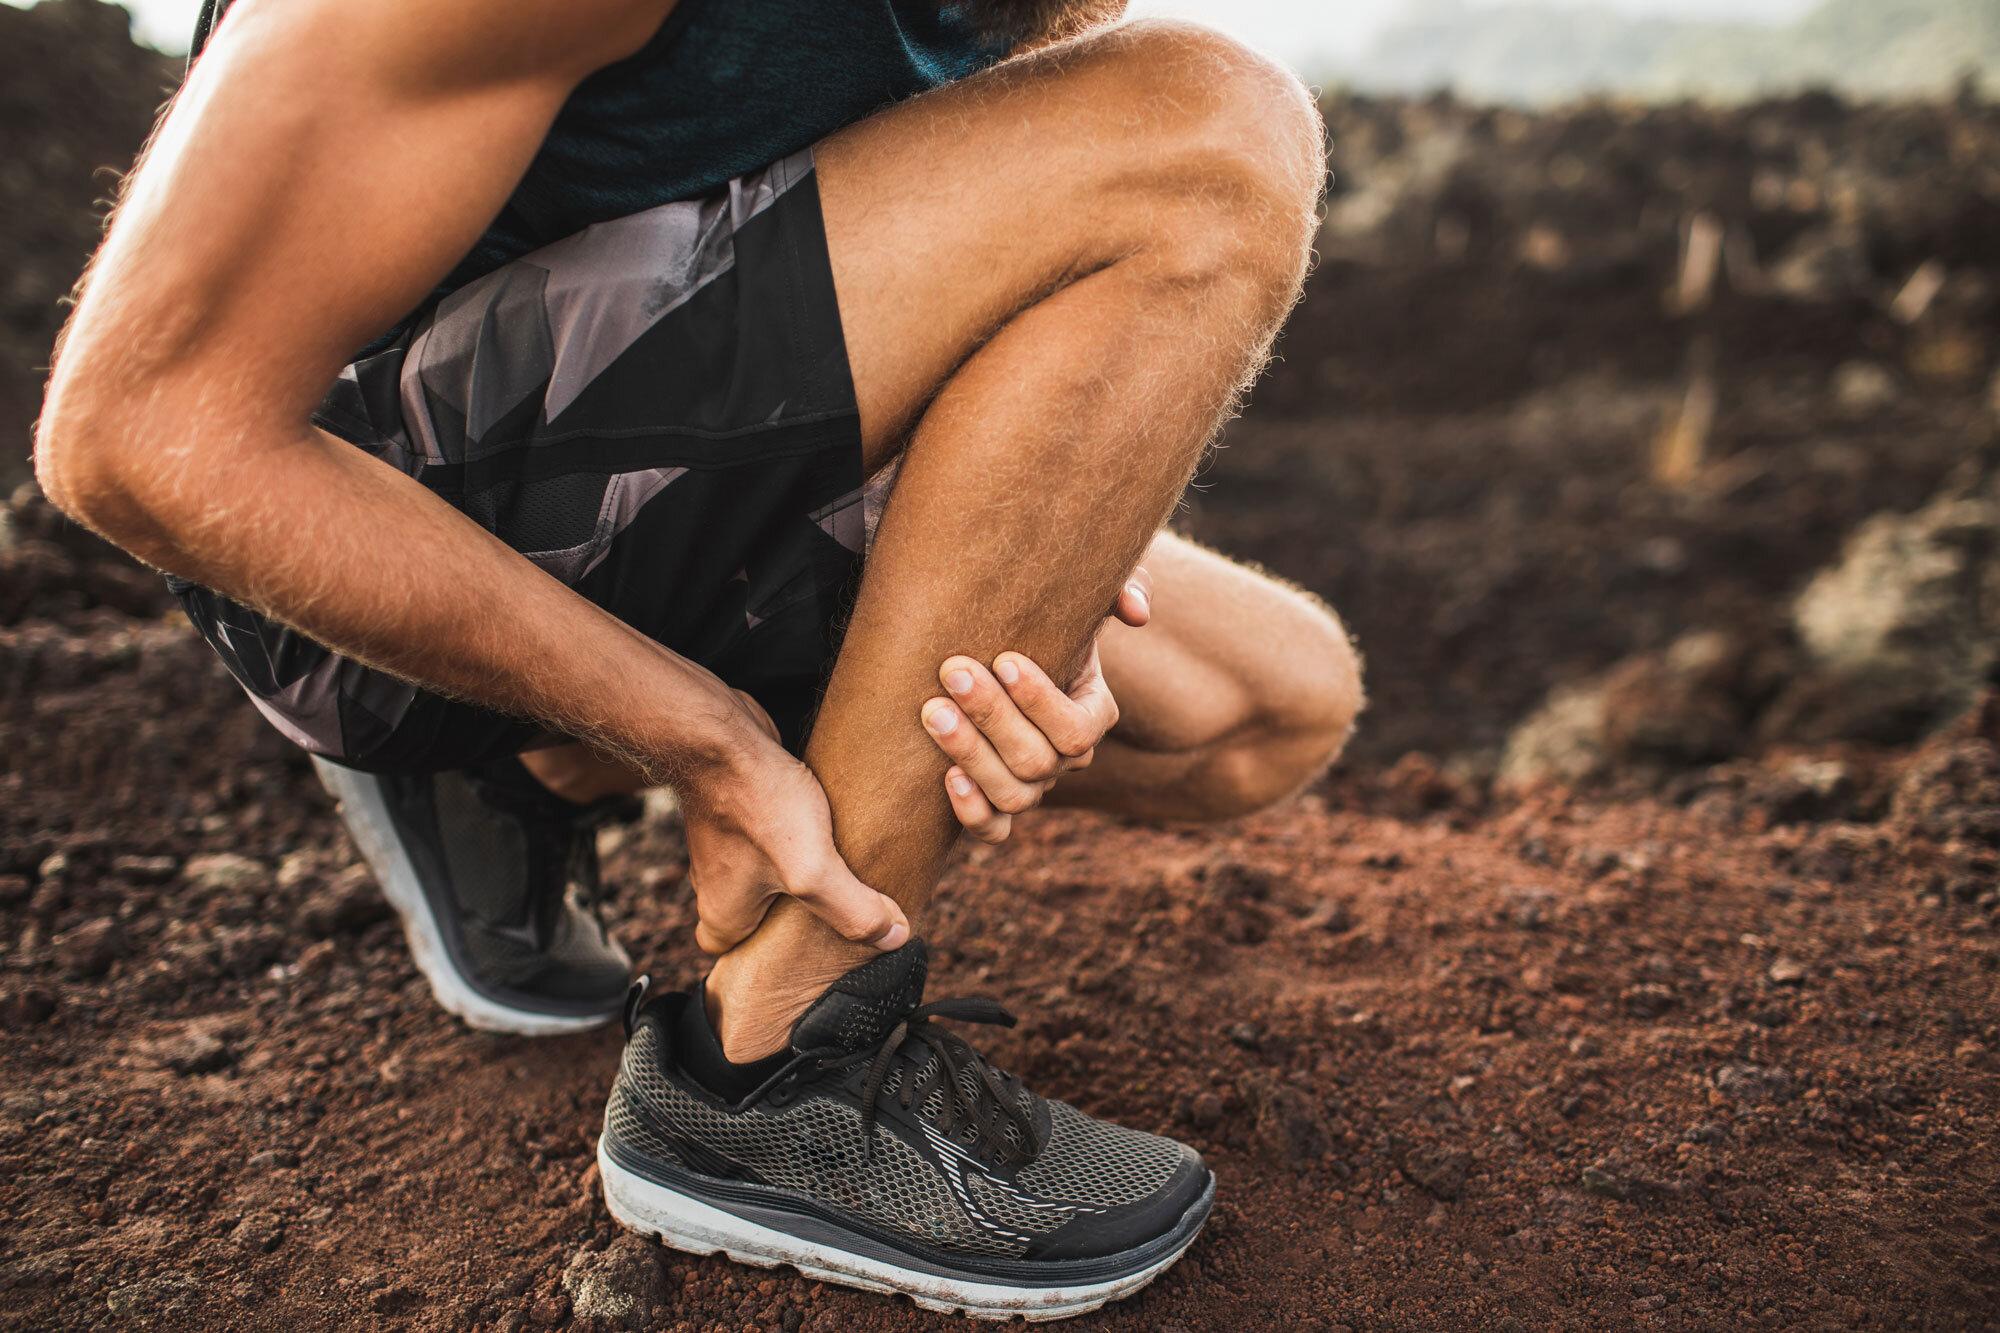 bigstock-Achilles-Injury-On-Running-Out-312835096web.jpg